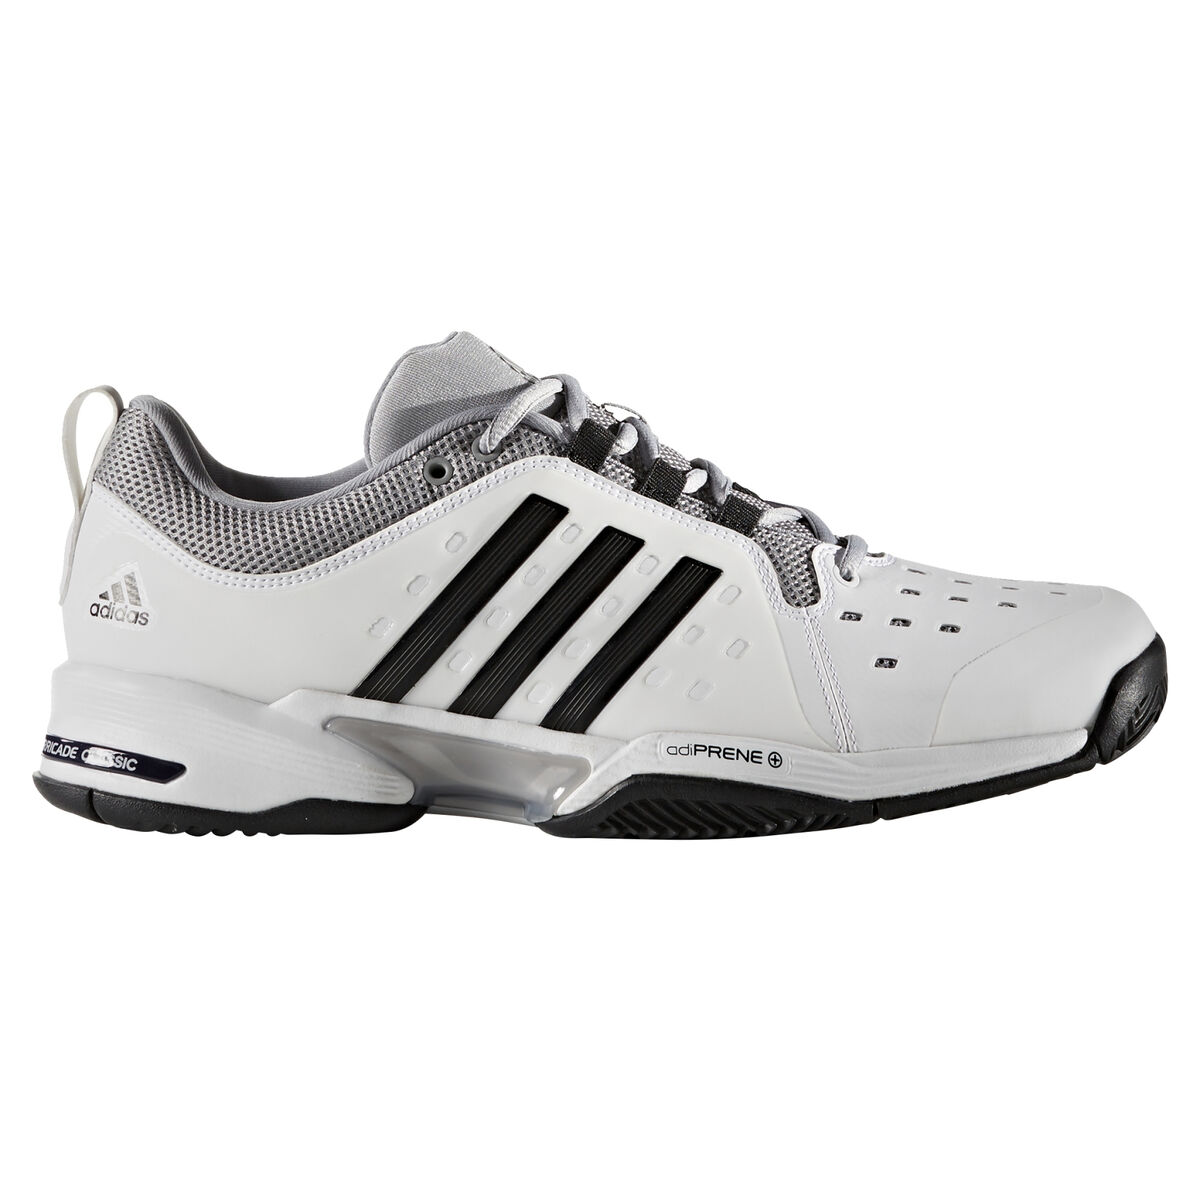 new style 5b408 c20f9 adidas Barricade Classic Wide 4E Men's Tennis Shoe - Black/Silver Zoom  Image